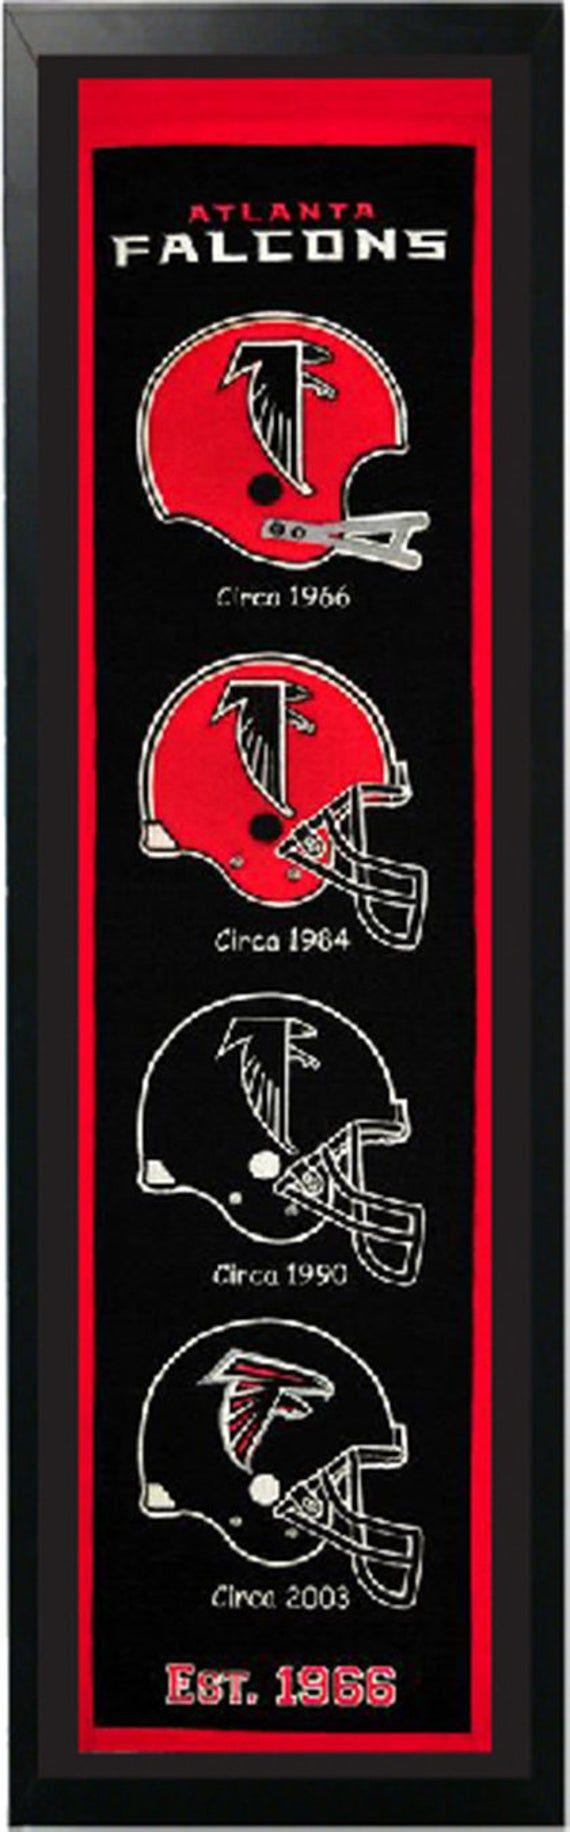 Atlanta Falcons Logo History Felt Banner 14 X 37 Etsy In 2020 Atlanta Falcons Logo Atlanta Falcons Atlanta Falcons Fans